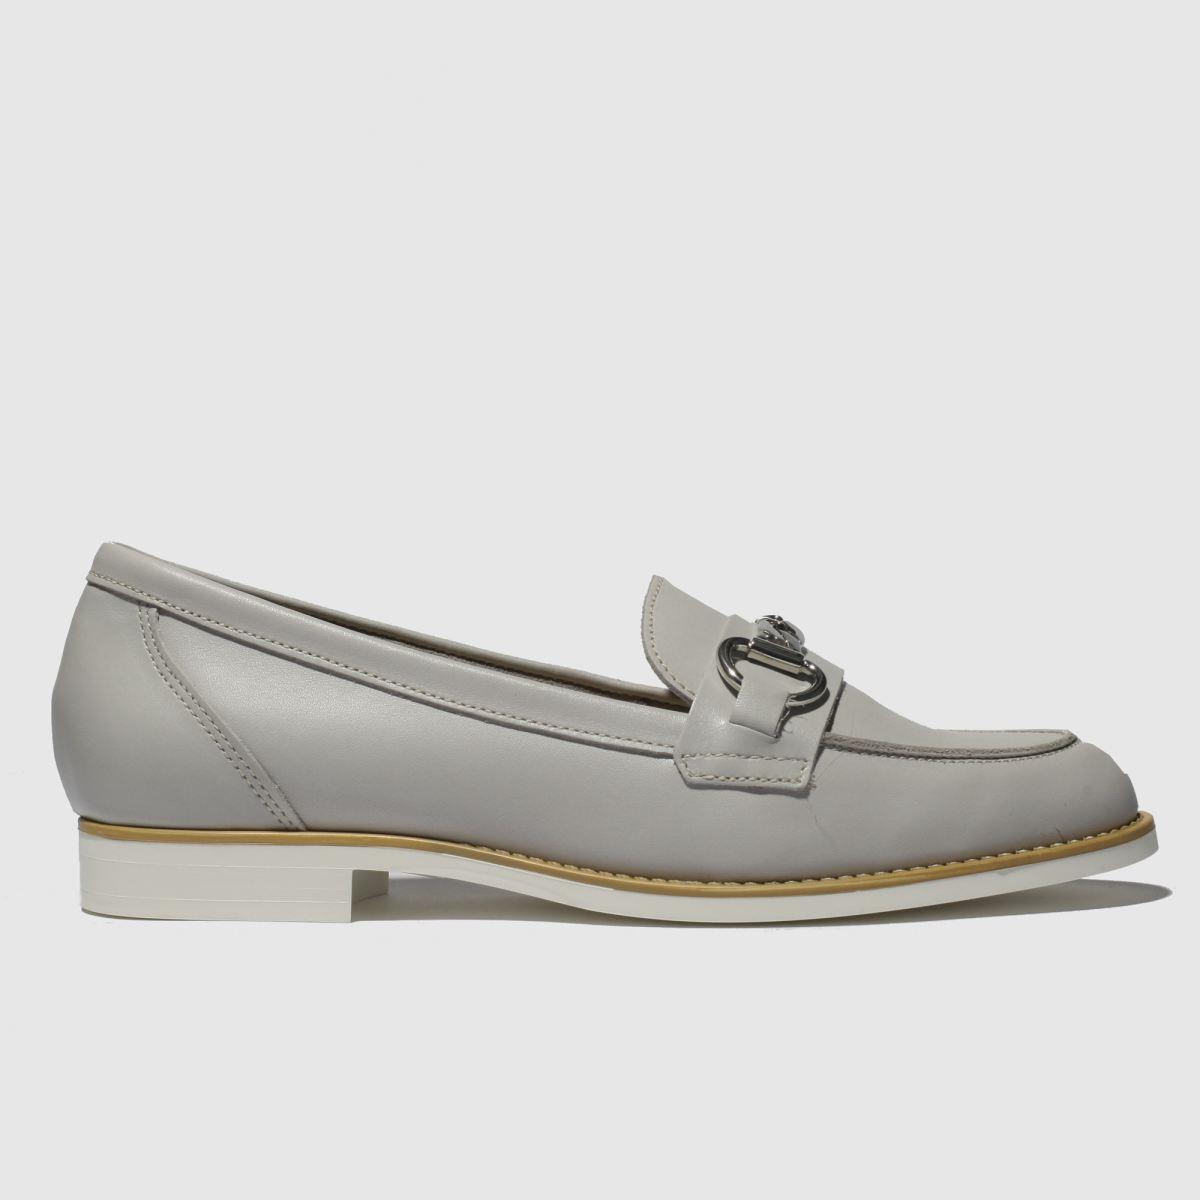 schuh Schuh Light Grey Eternity Flat Shoes